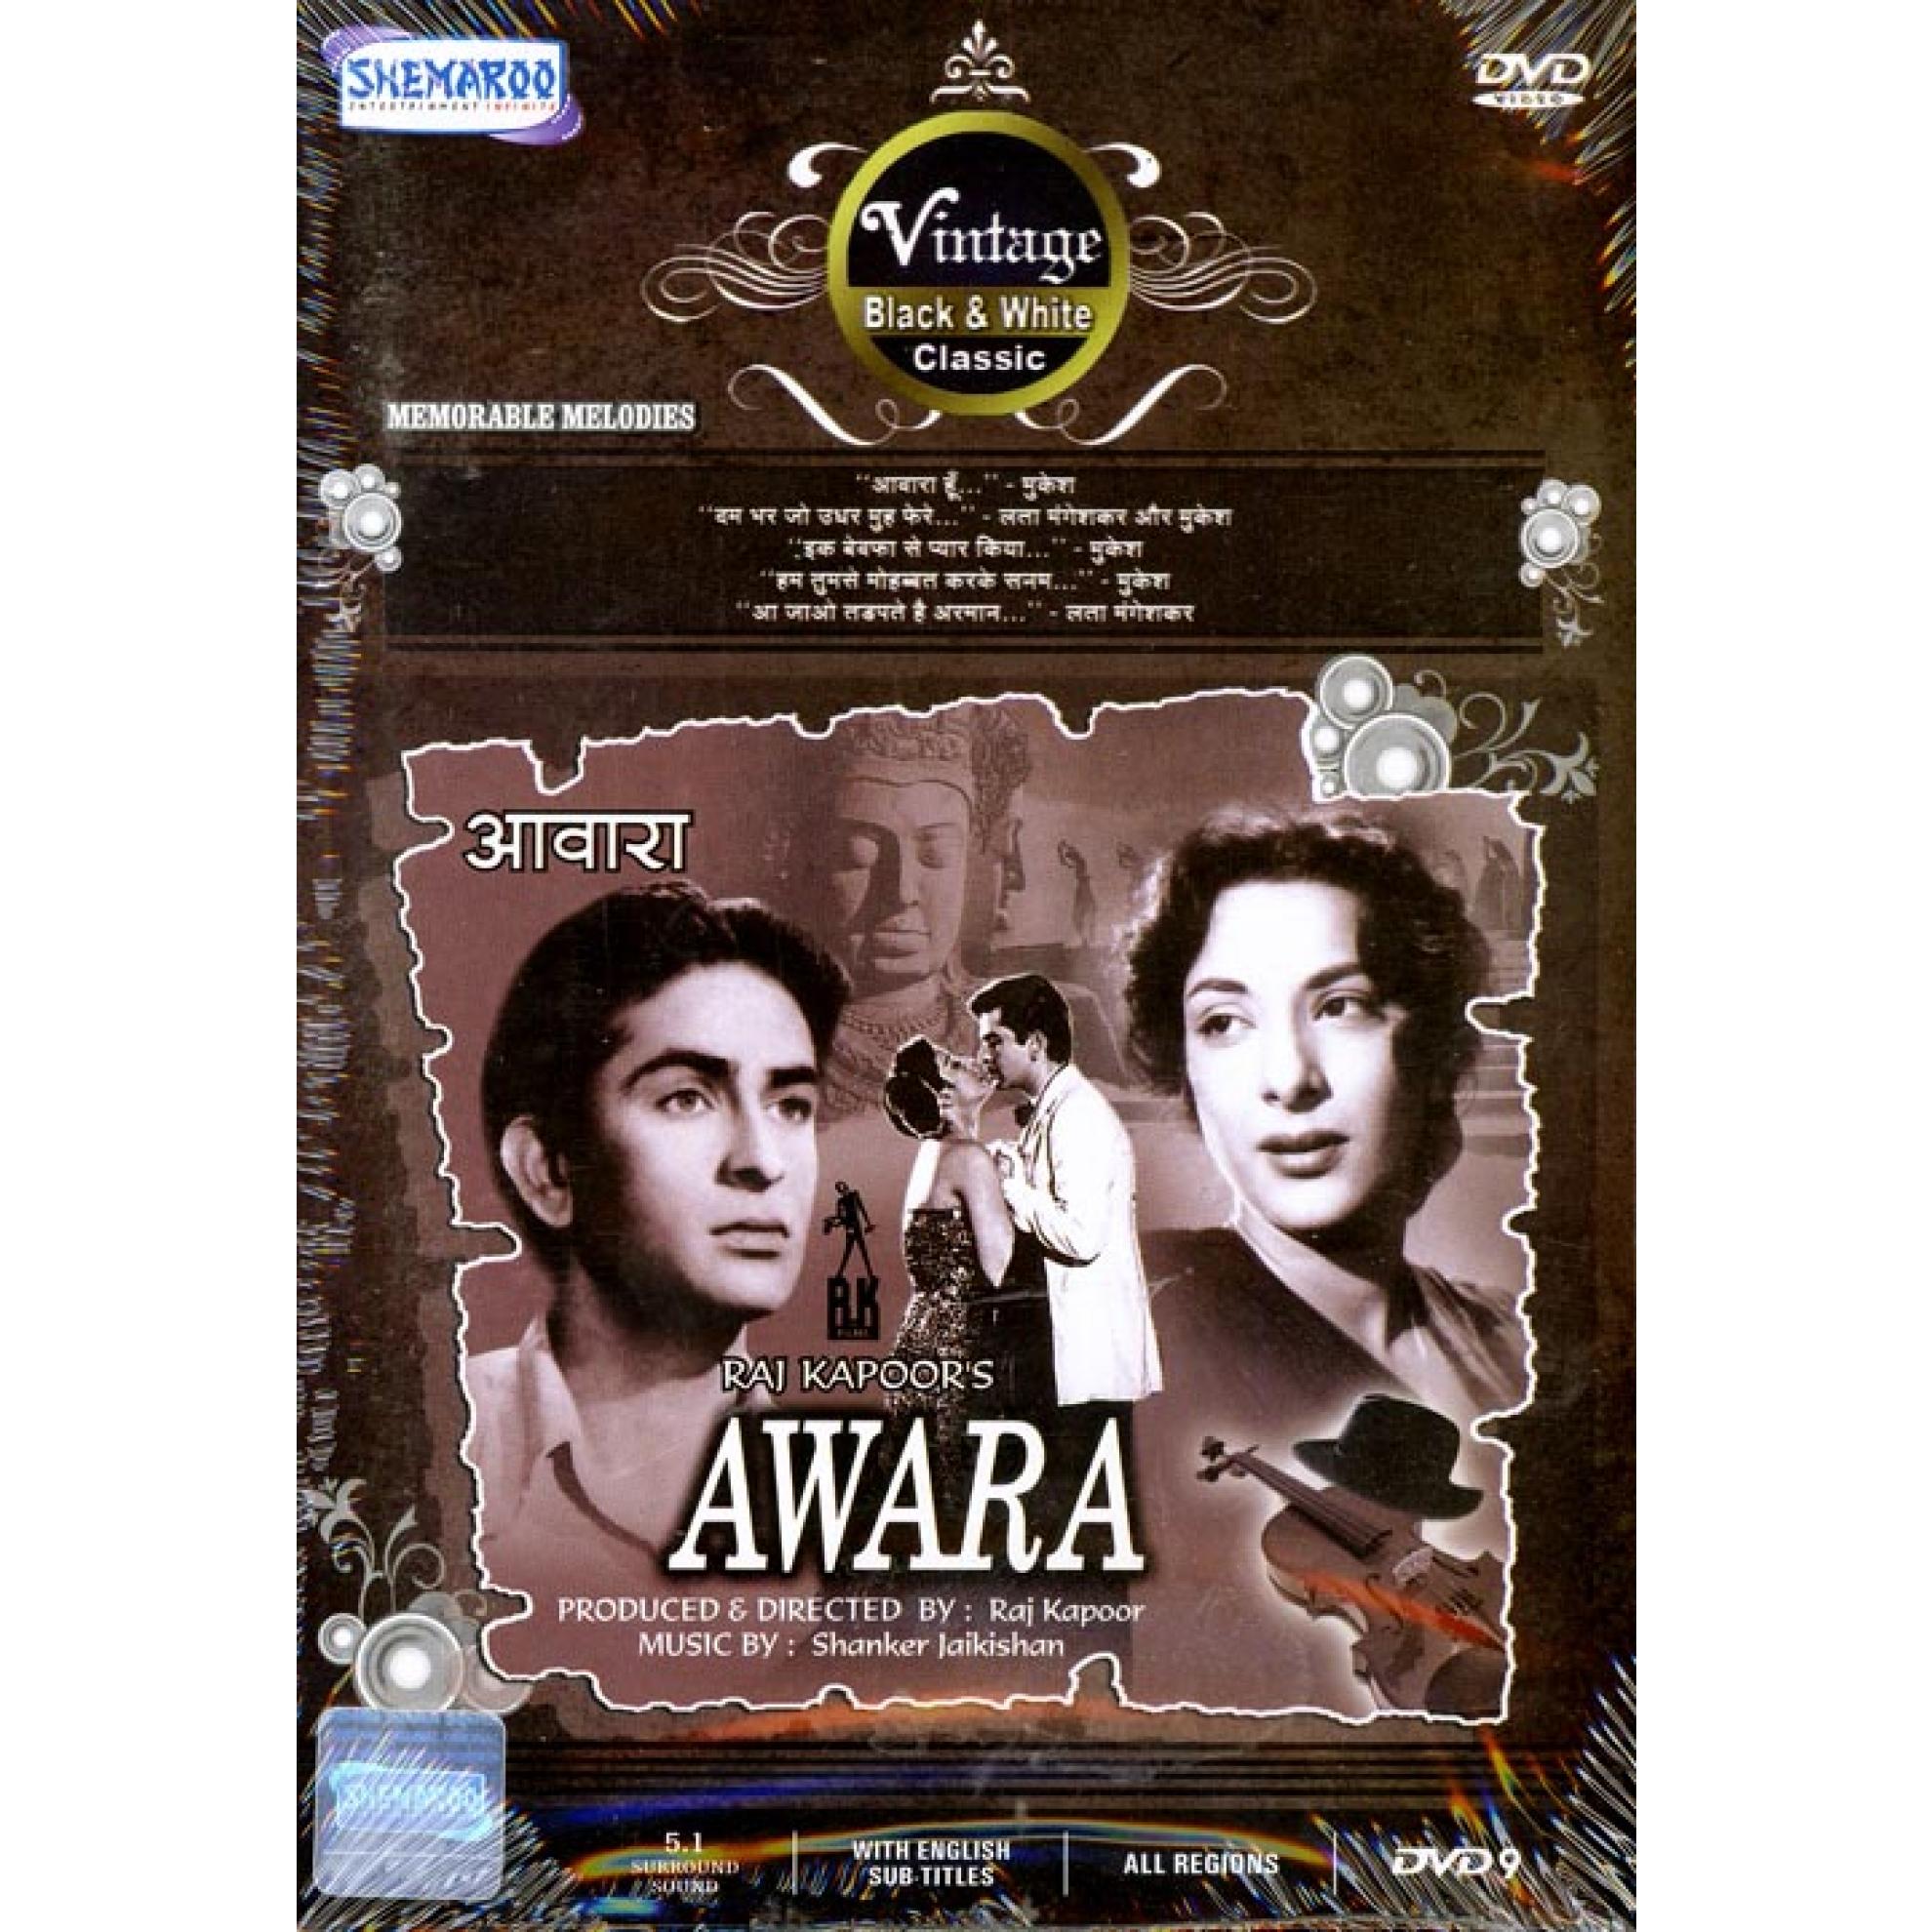 awara dvd with raj kapoor